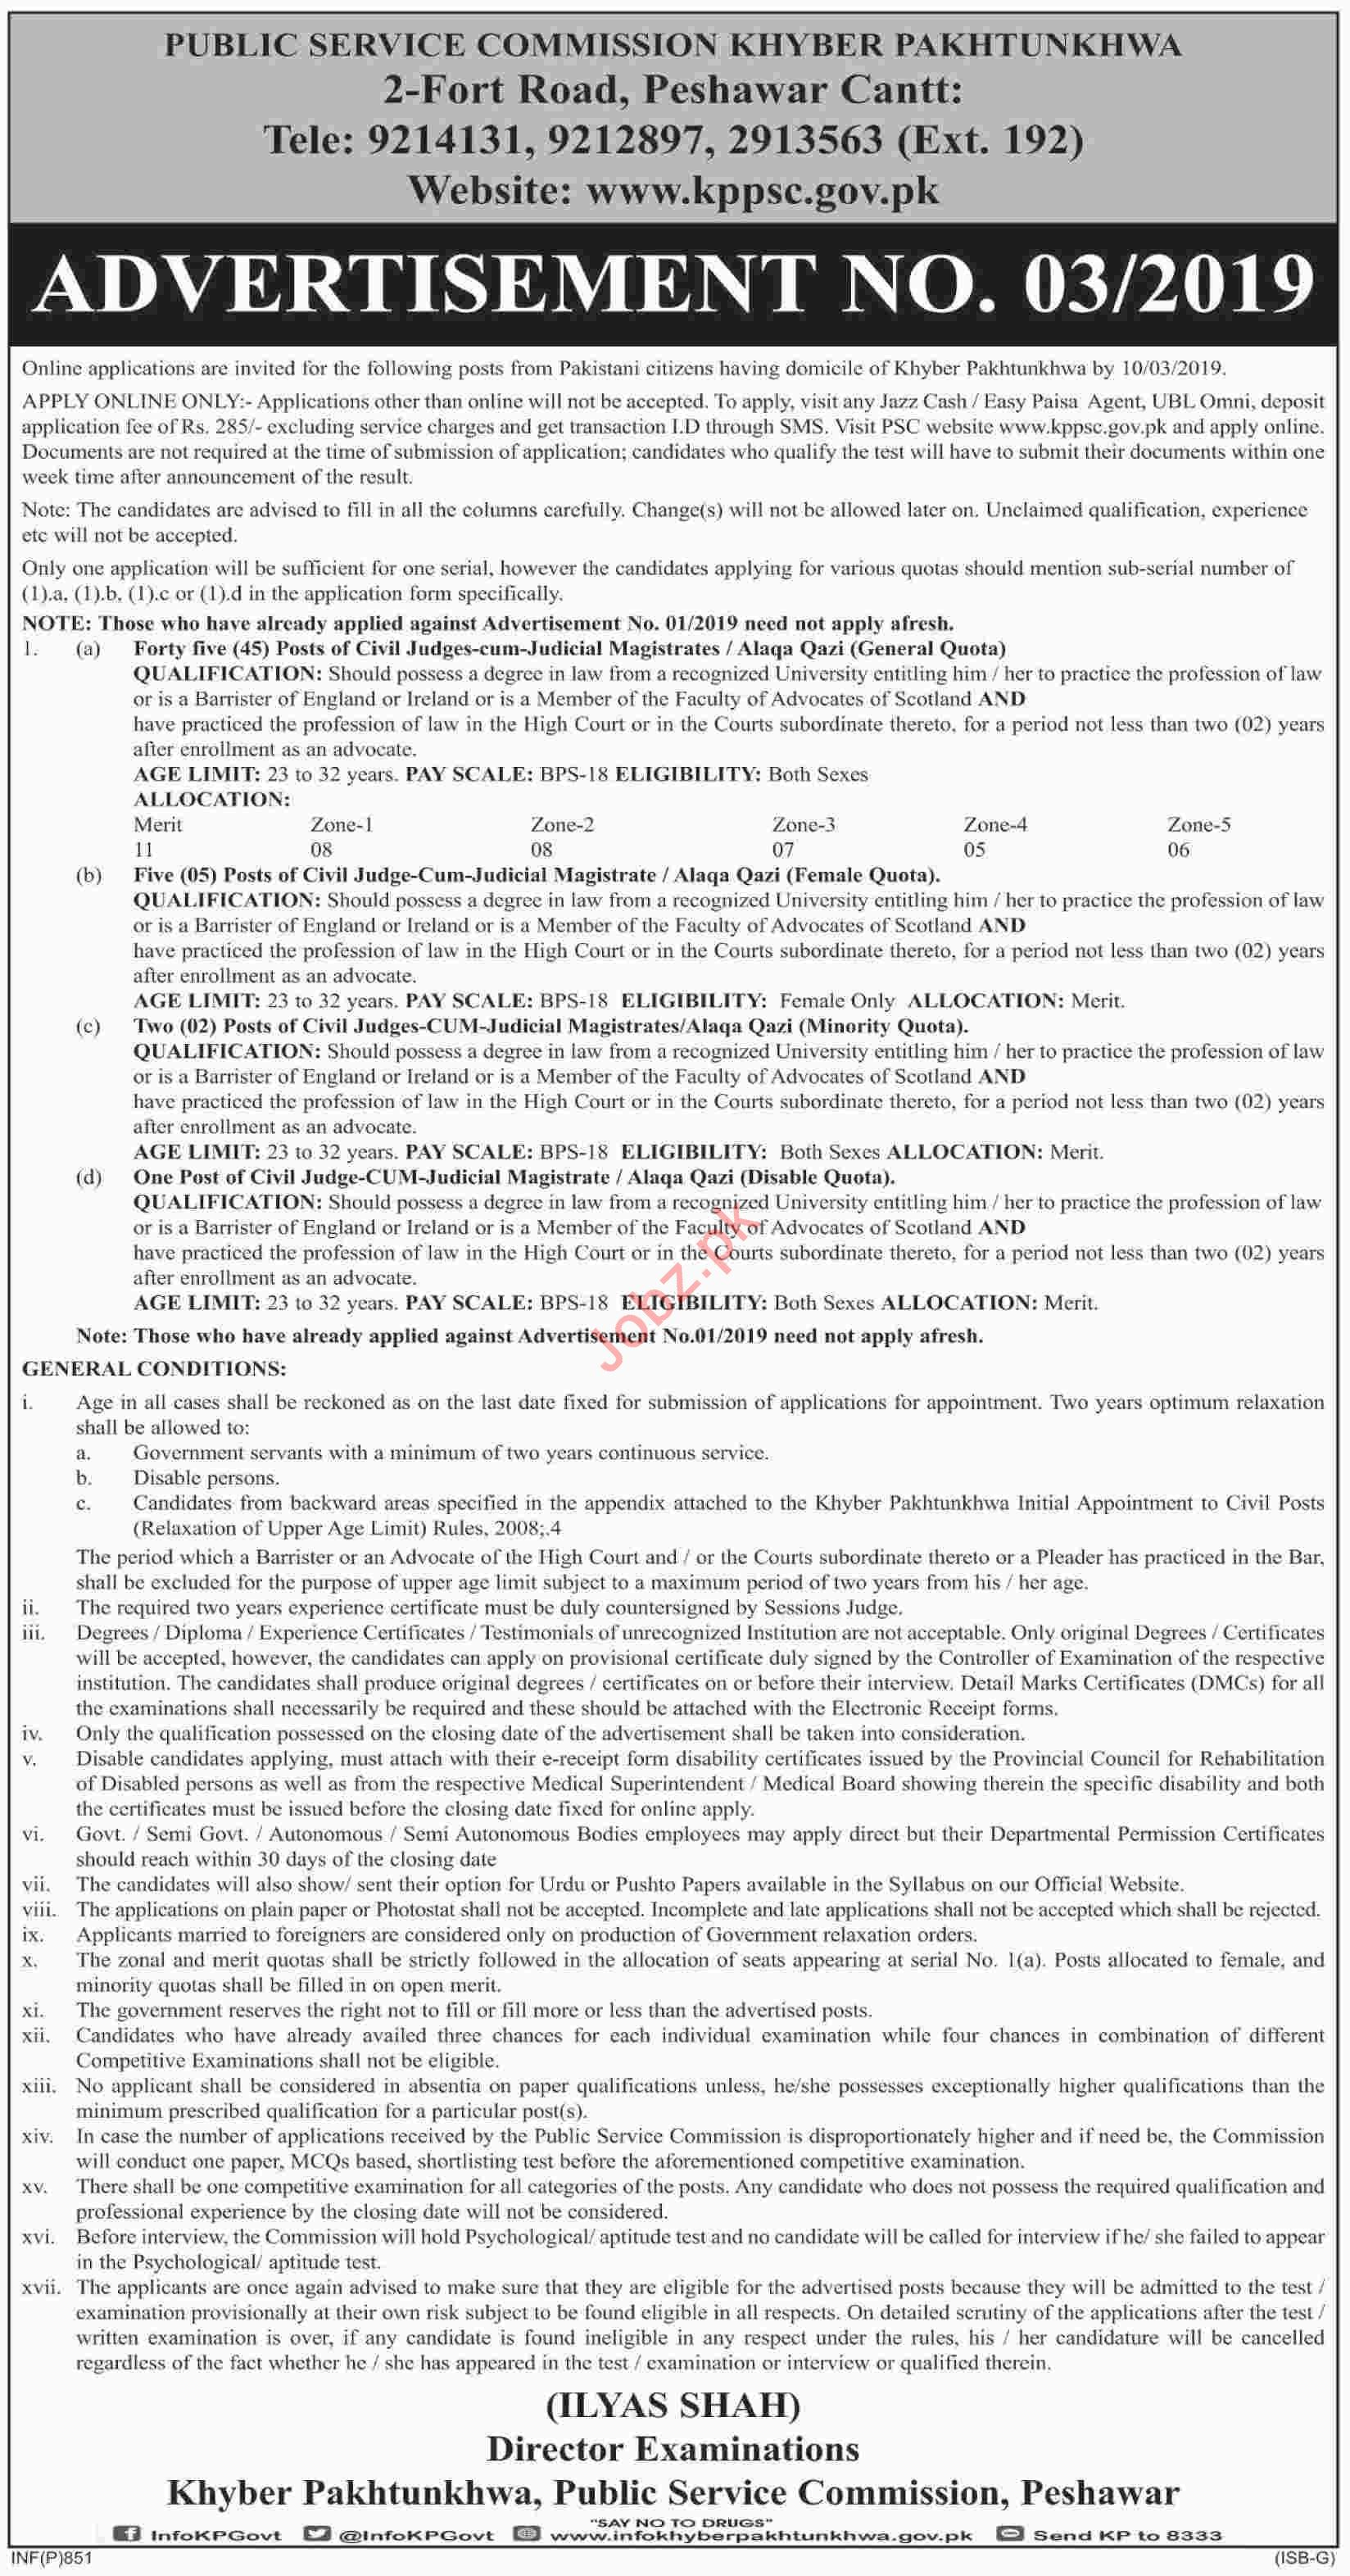 KPPSC Khyber Pakhtunkhwa Public Service Commission Jobs 2019